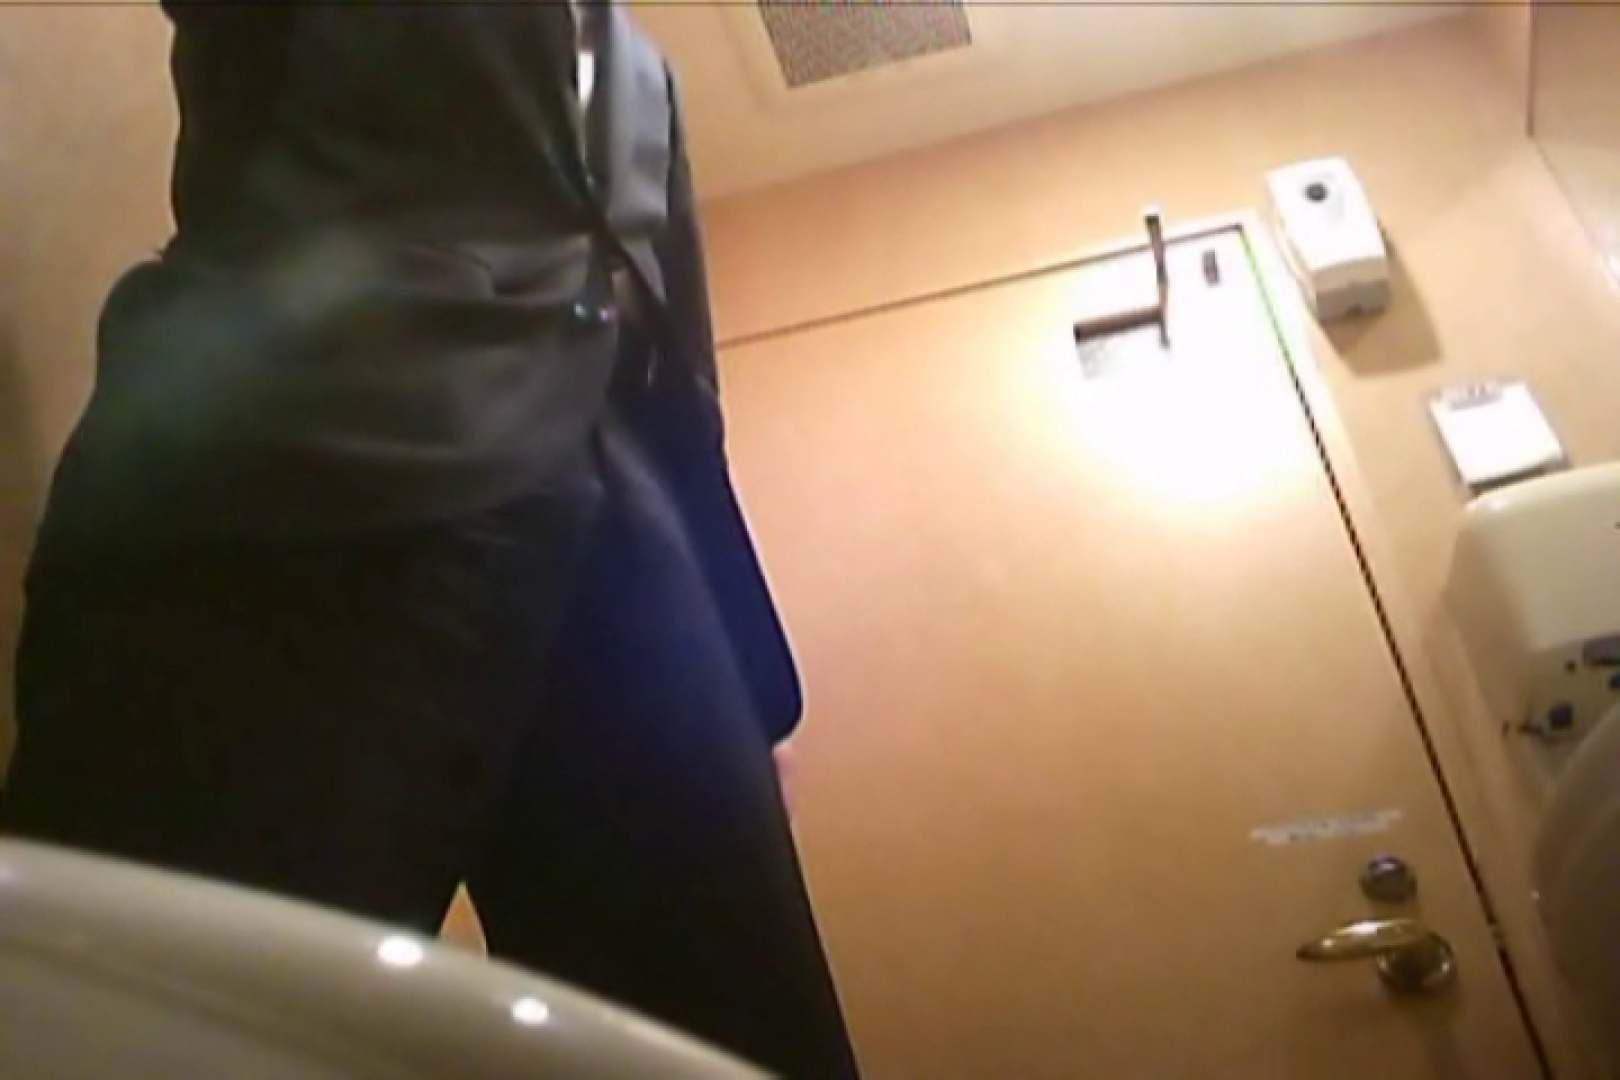 SEASON 2ND!掴み取りさんの洗面所覗き!in新幹線!VOL.13 リーマン系ボーイズ | 人気シリーズ  80pic 16